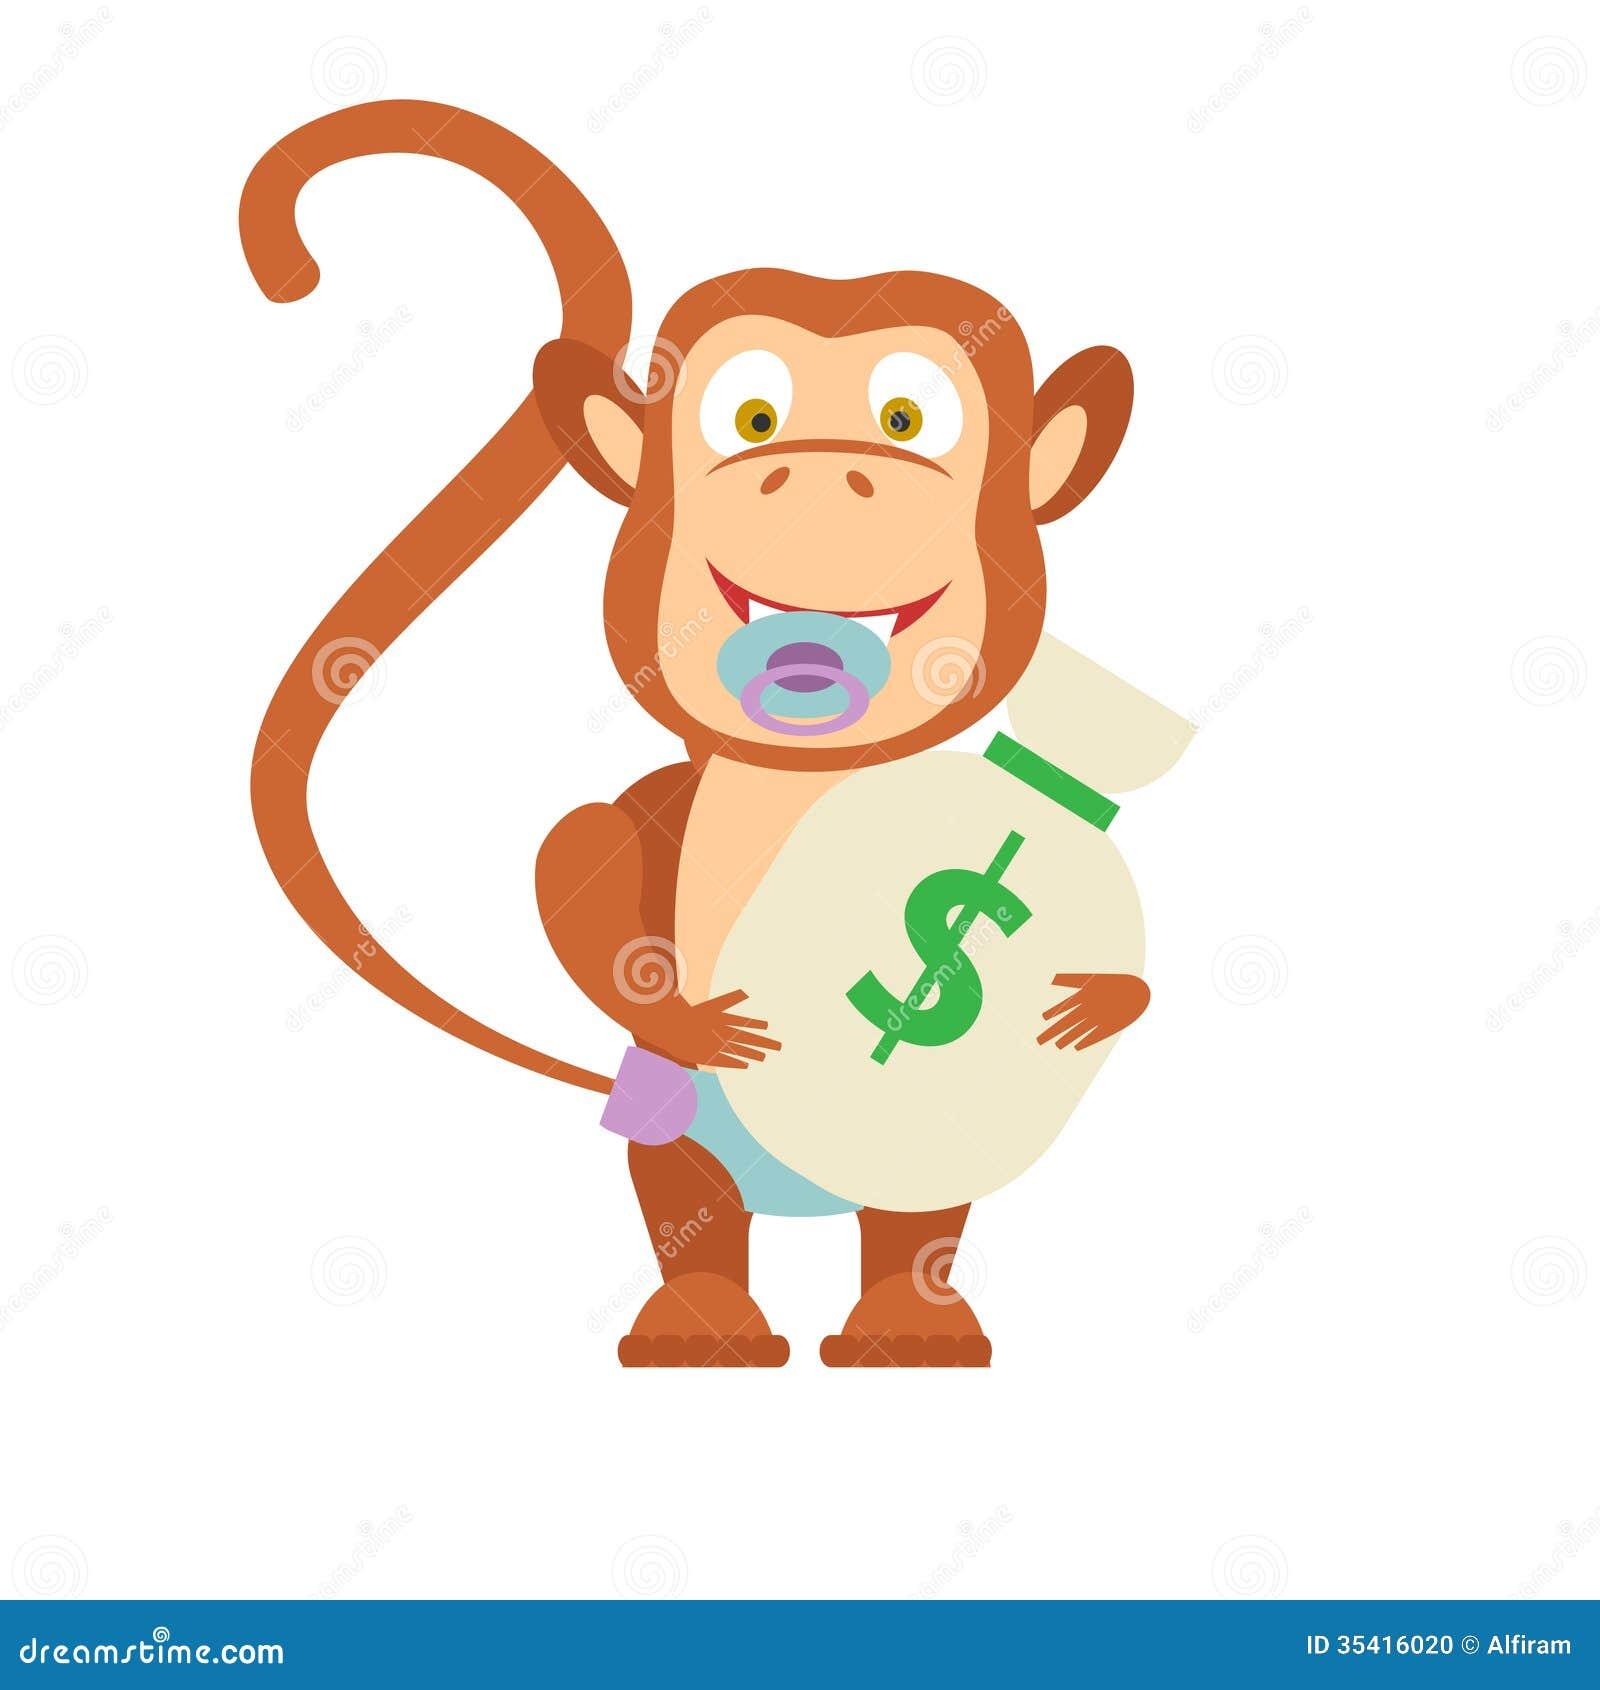 Monkey Baby With Money Bag Stock Photo - Image: 35416020